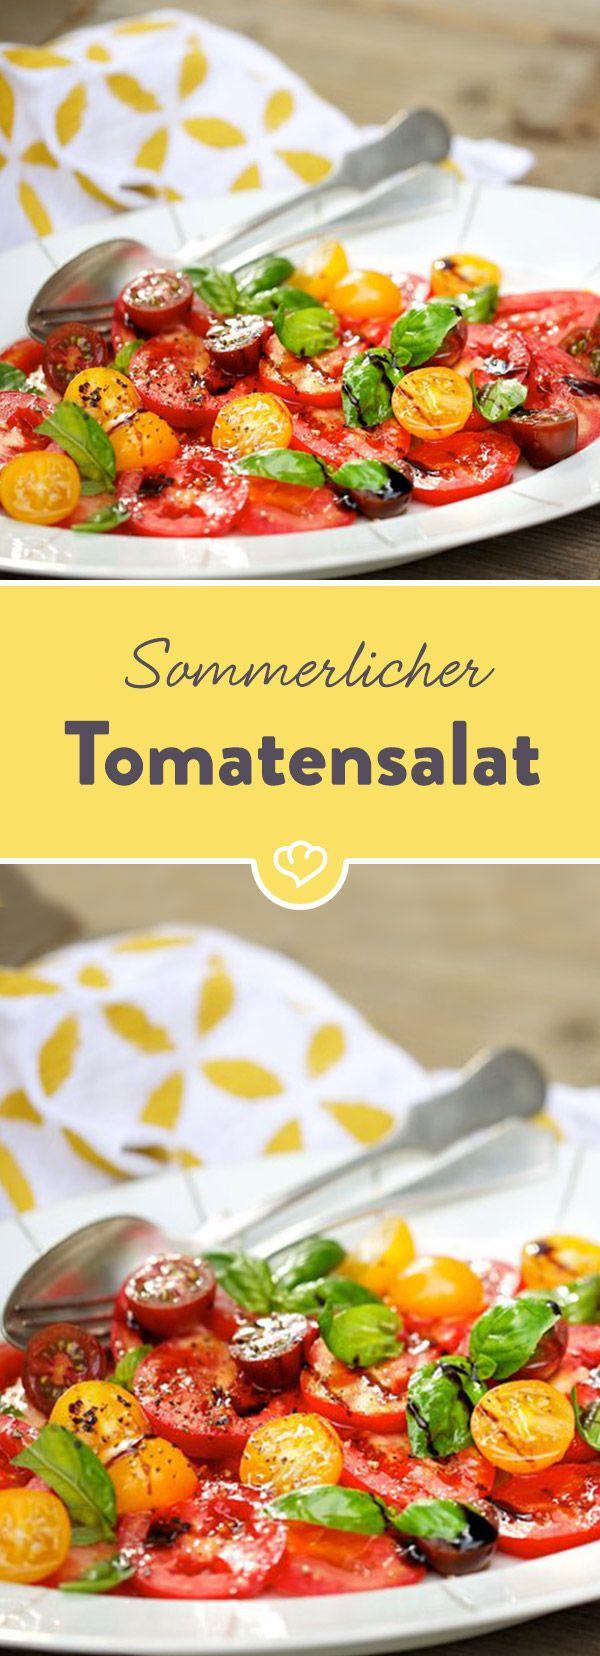 Photo of Colorful tomato salad